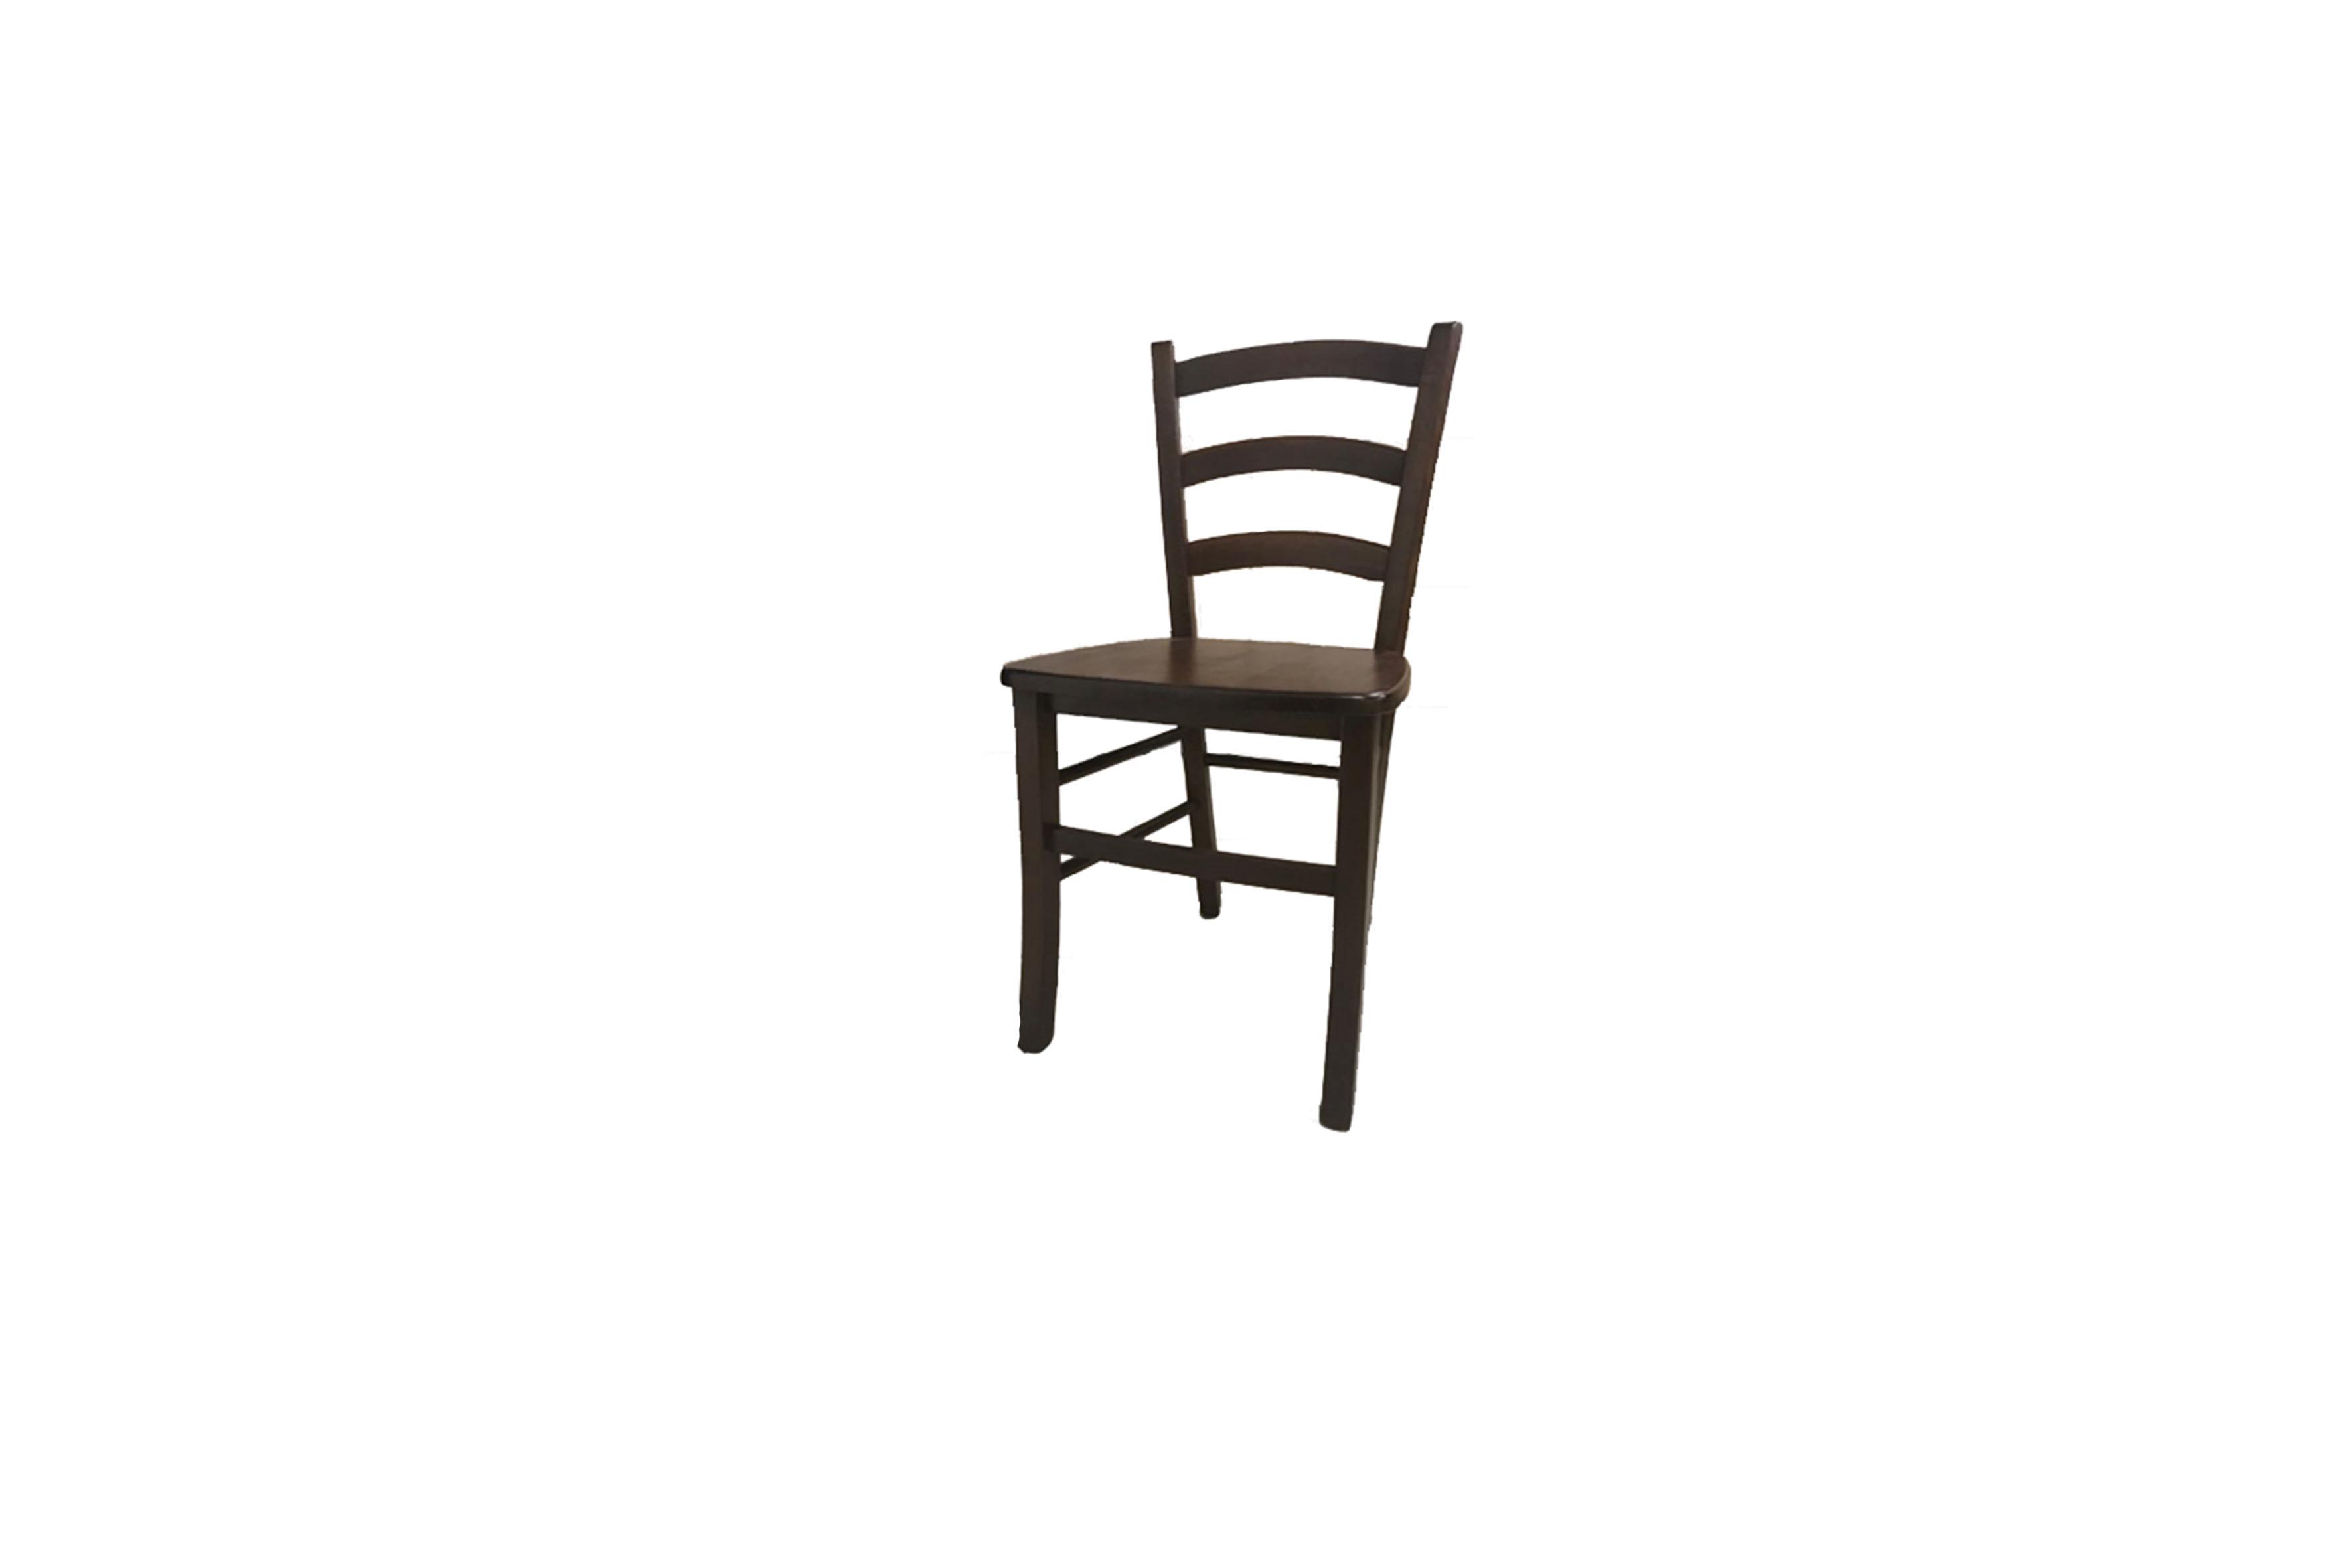 paesana chair.jpg